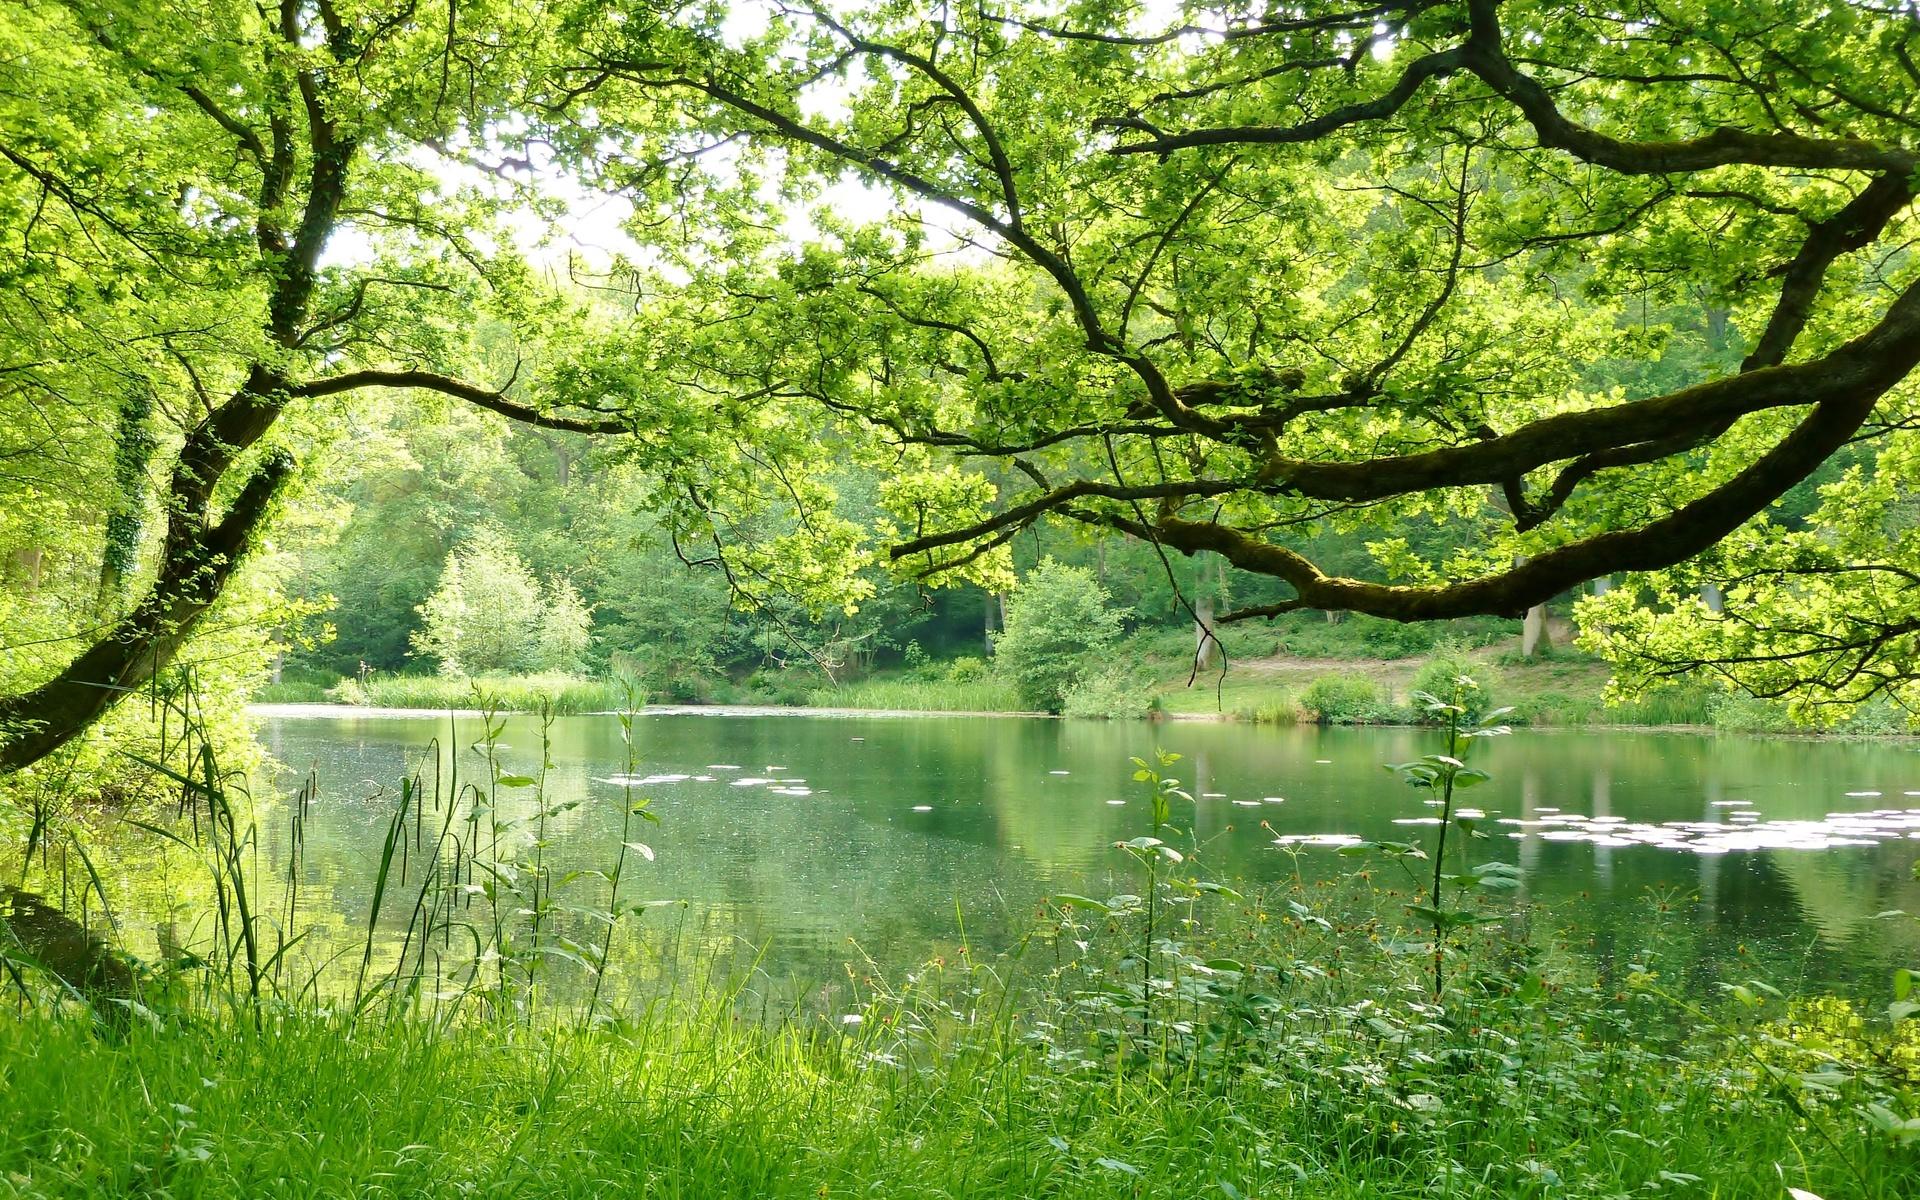 Обои на рабочий стол 1366х768 природа и лес весна